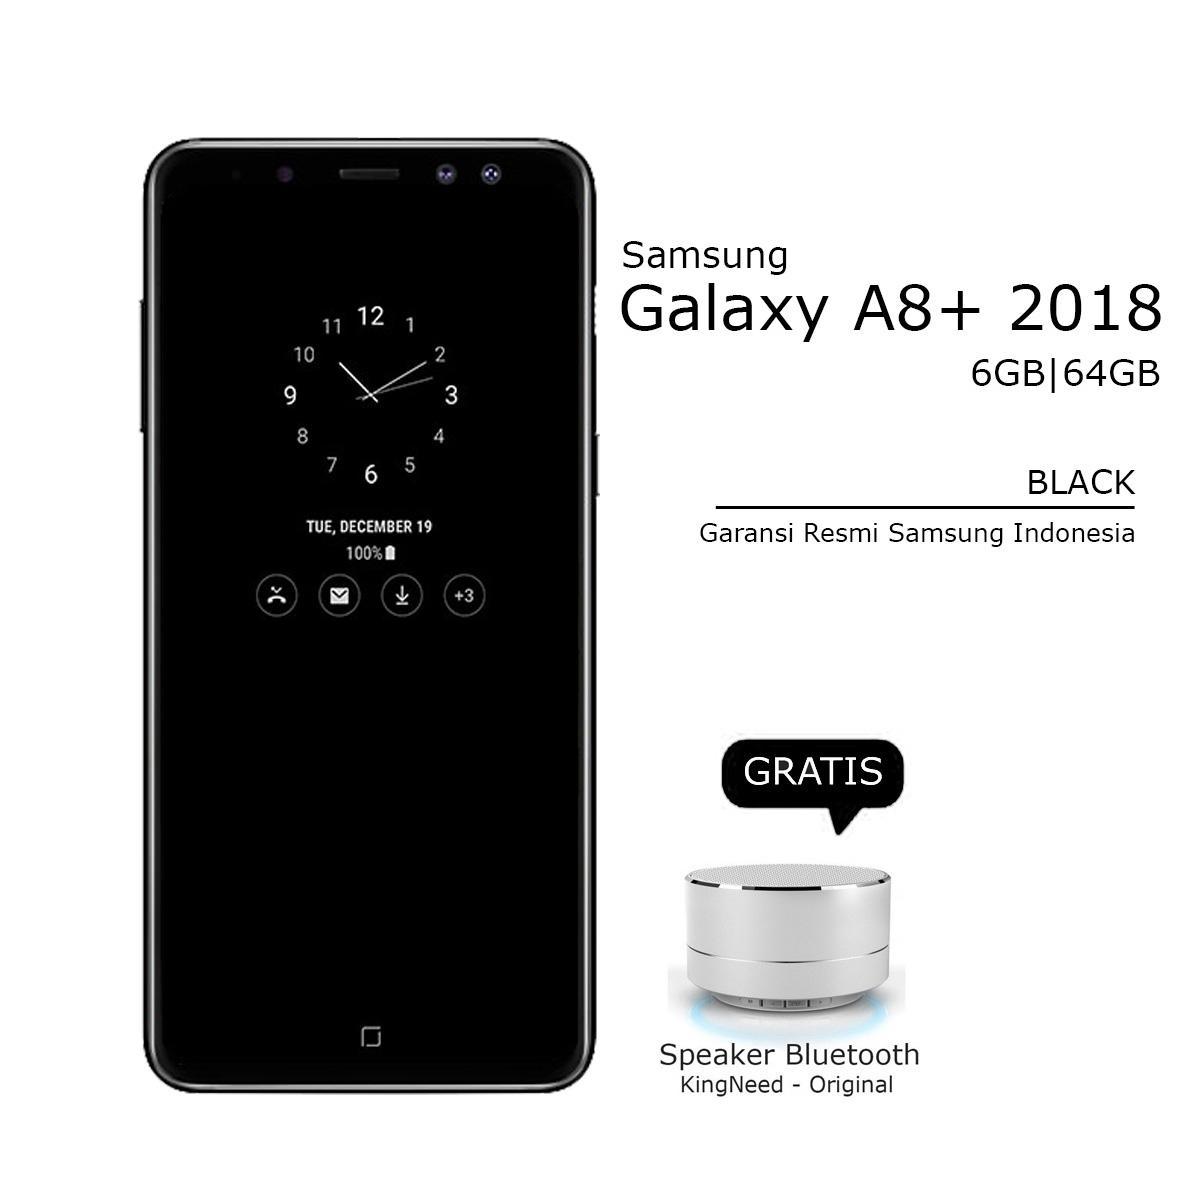 SAMSUNG A8+ / A8 PLUS 2018 - 6/64GB - 4G LTE - BLACK